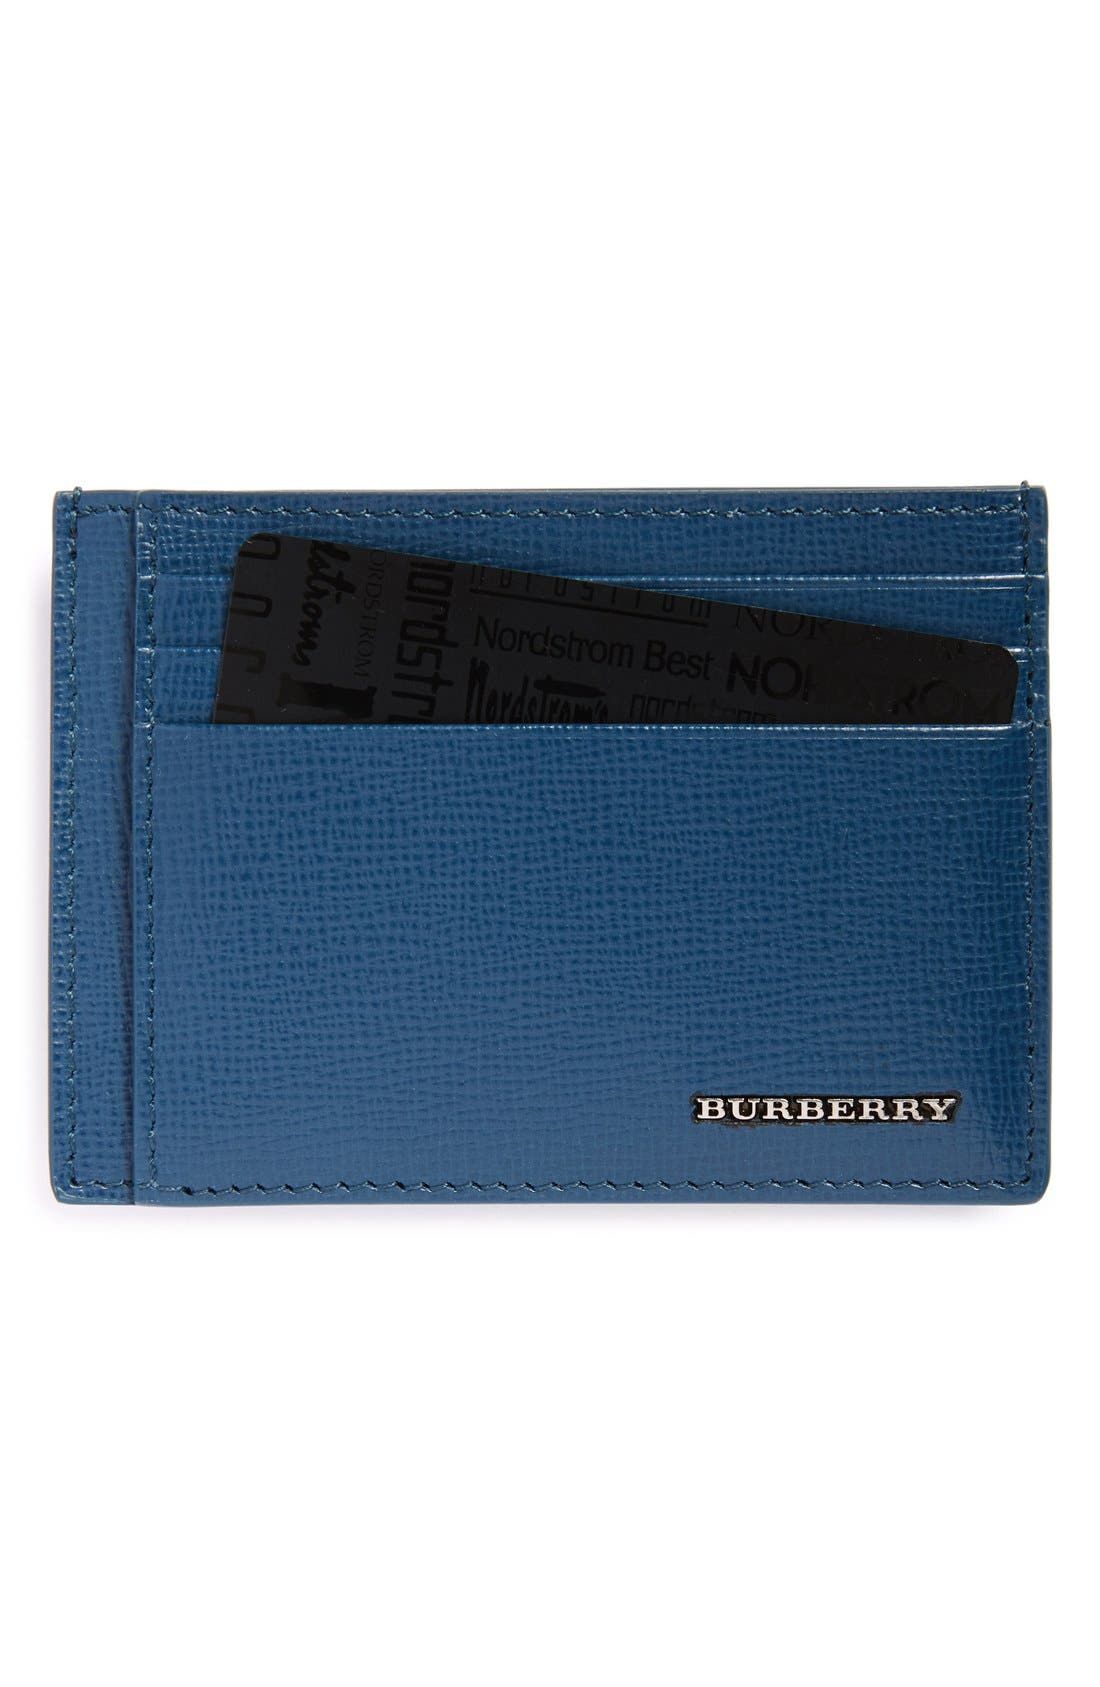 BURBERRY 'Bernie' Leather Card Case, Main, color, 452